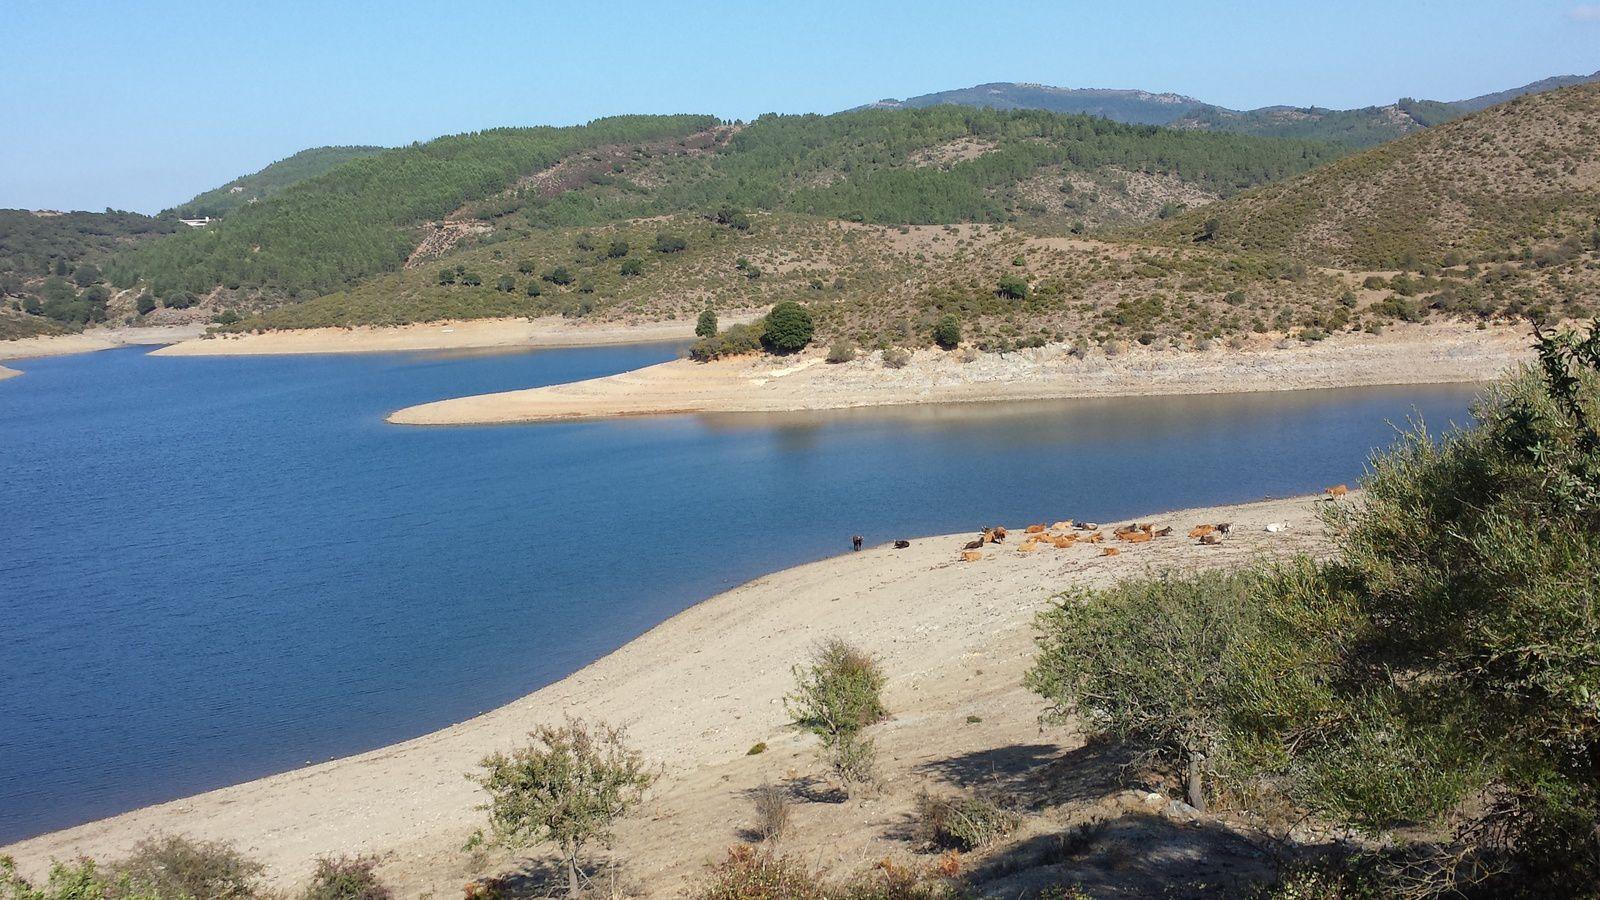 Bari Sardo, la grotte de Su Marmuri et le lac de Fluemendosa